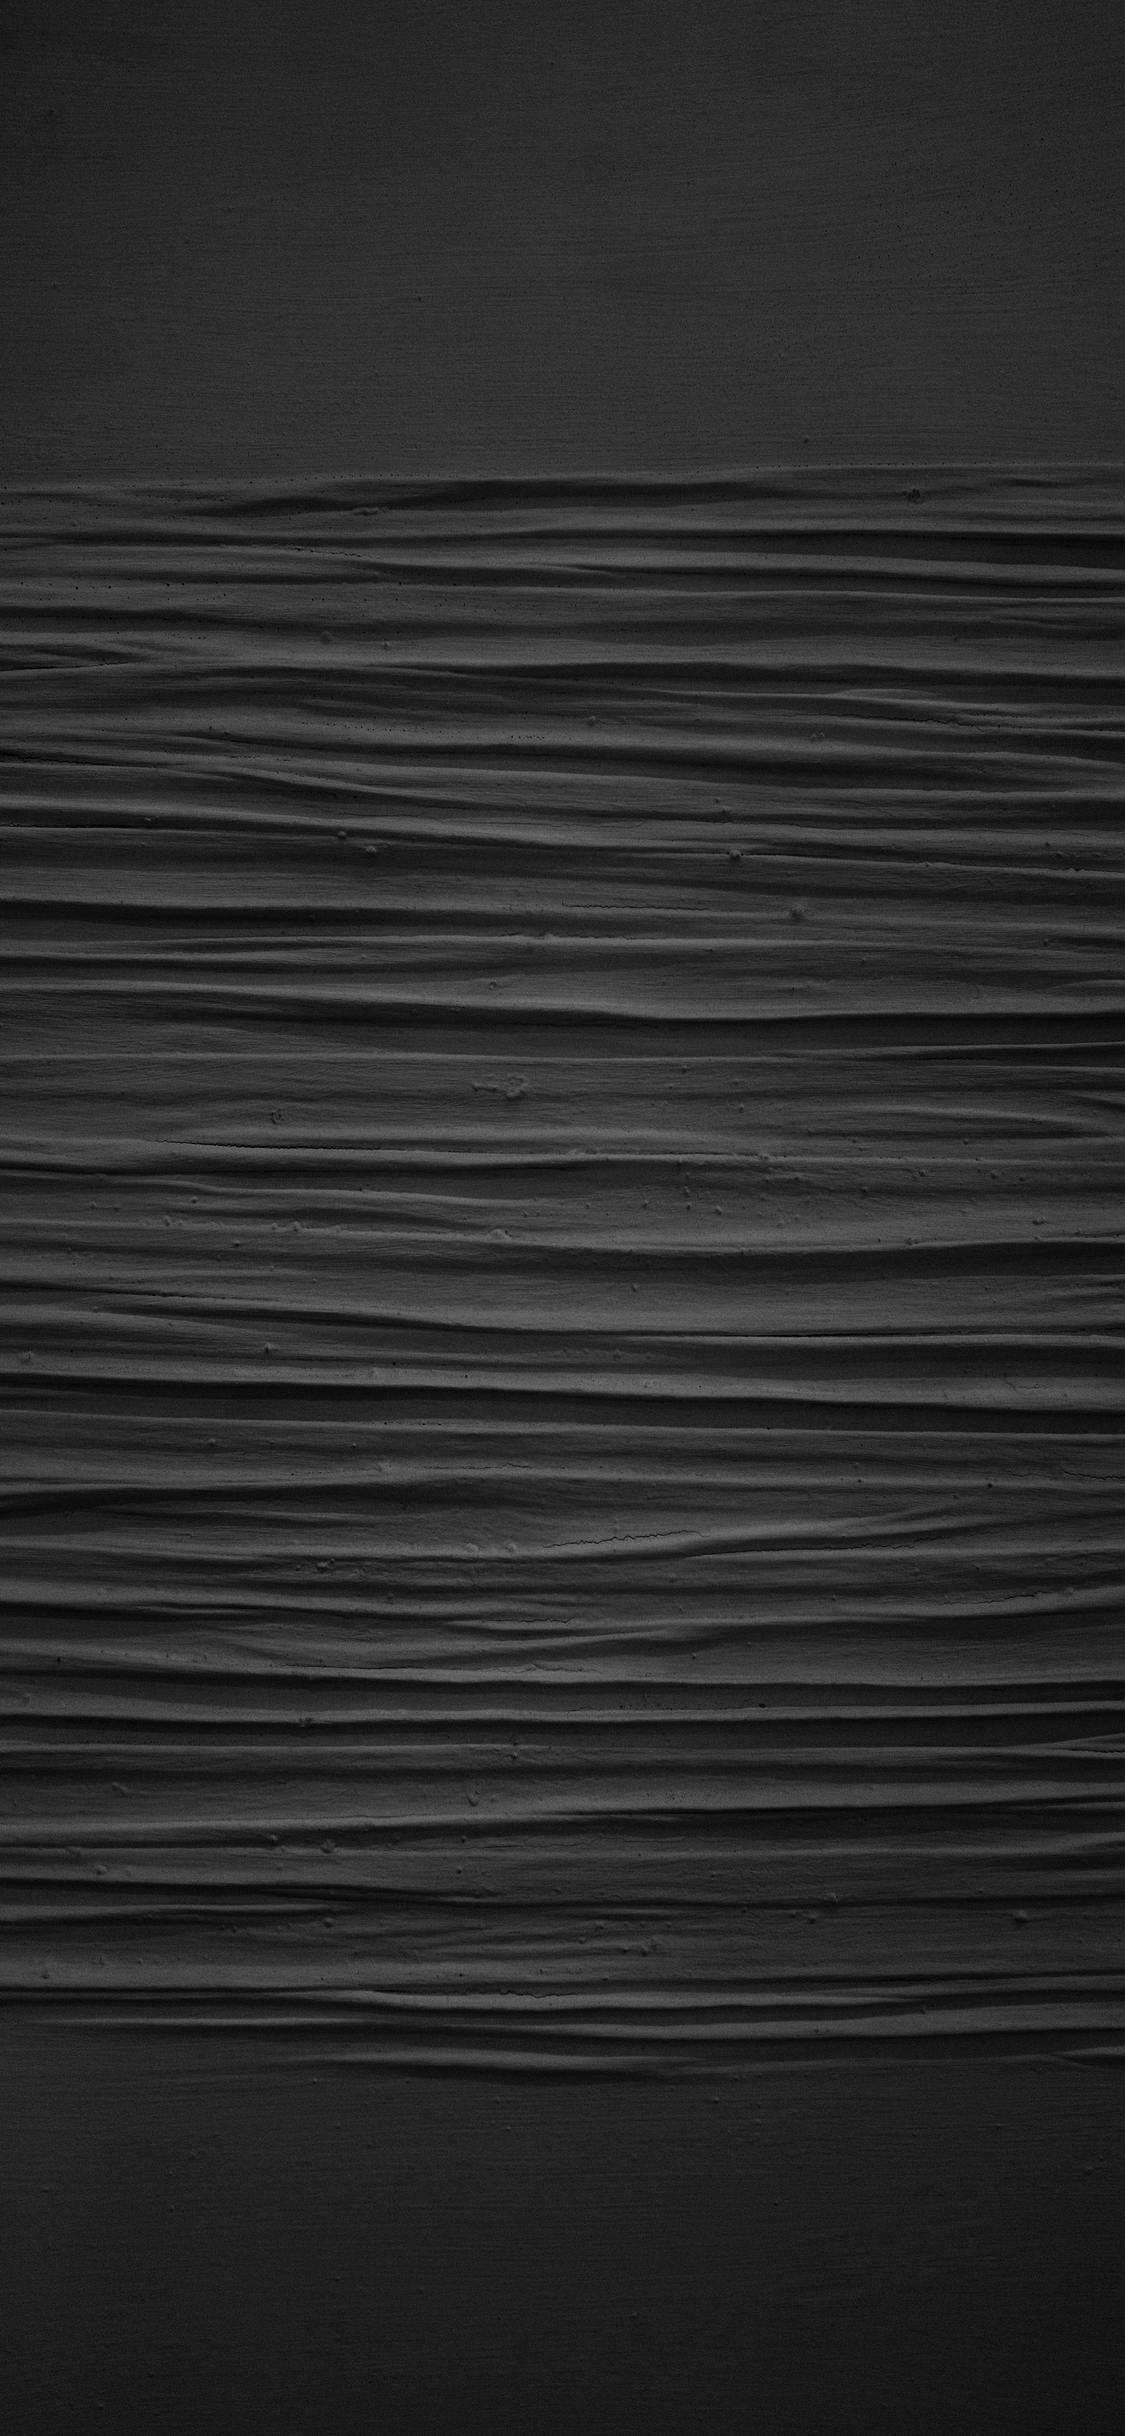 Best Black Wallpaper 4k Backgrounds Black Wallpaper Black Colour Background Textured Wallpaper